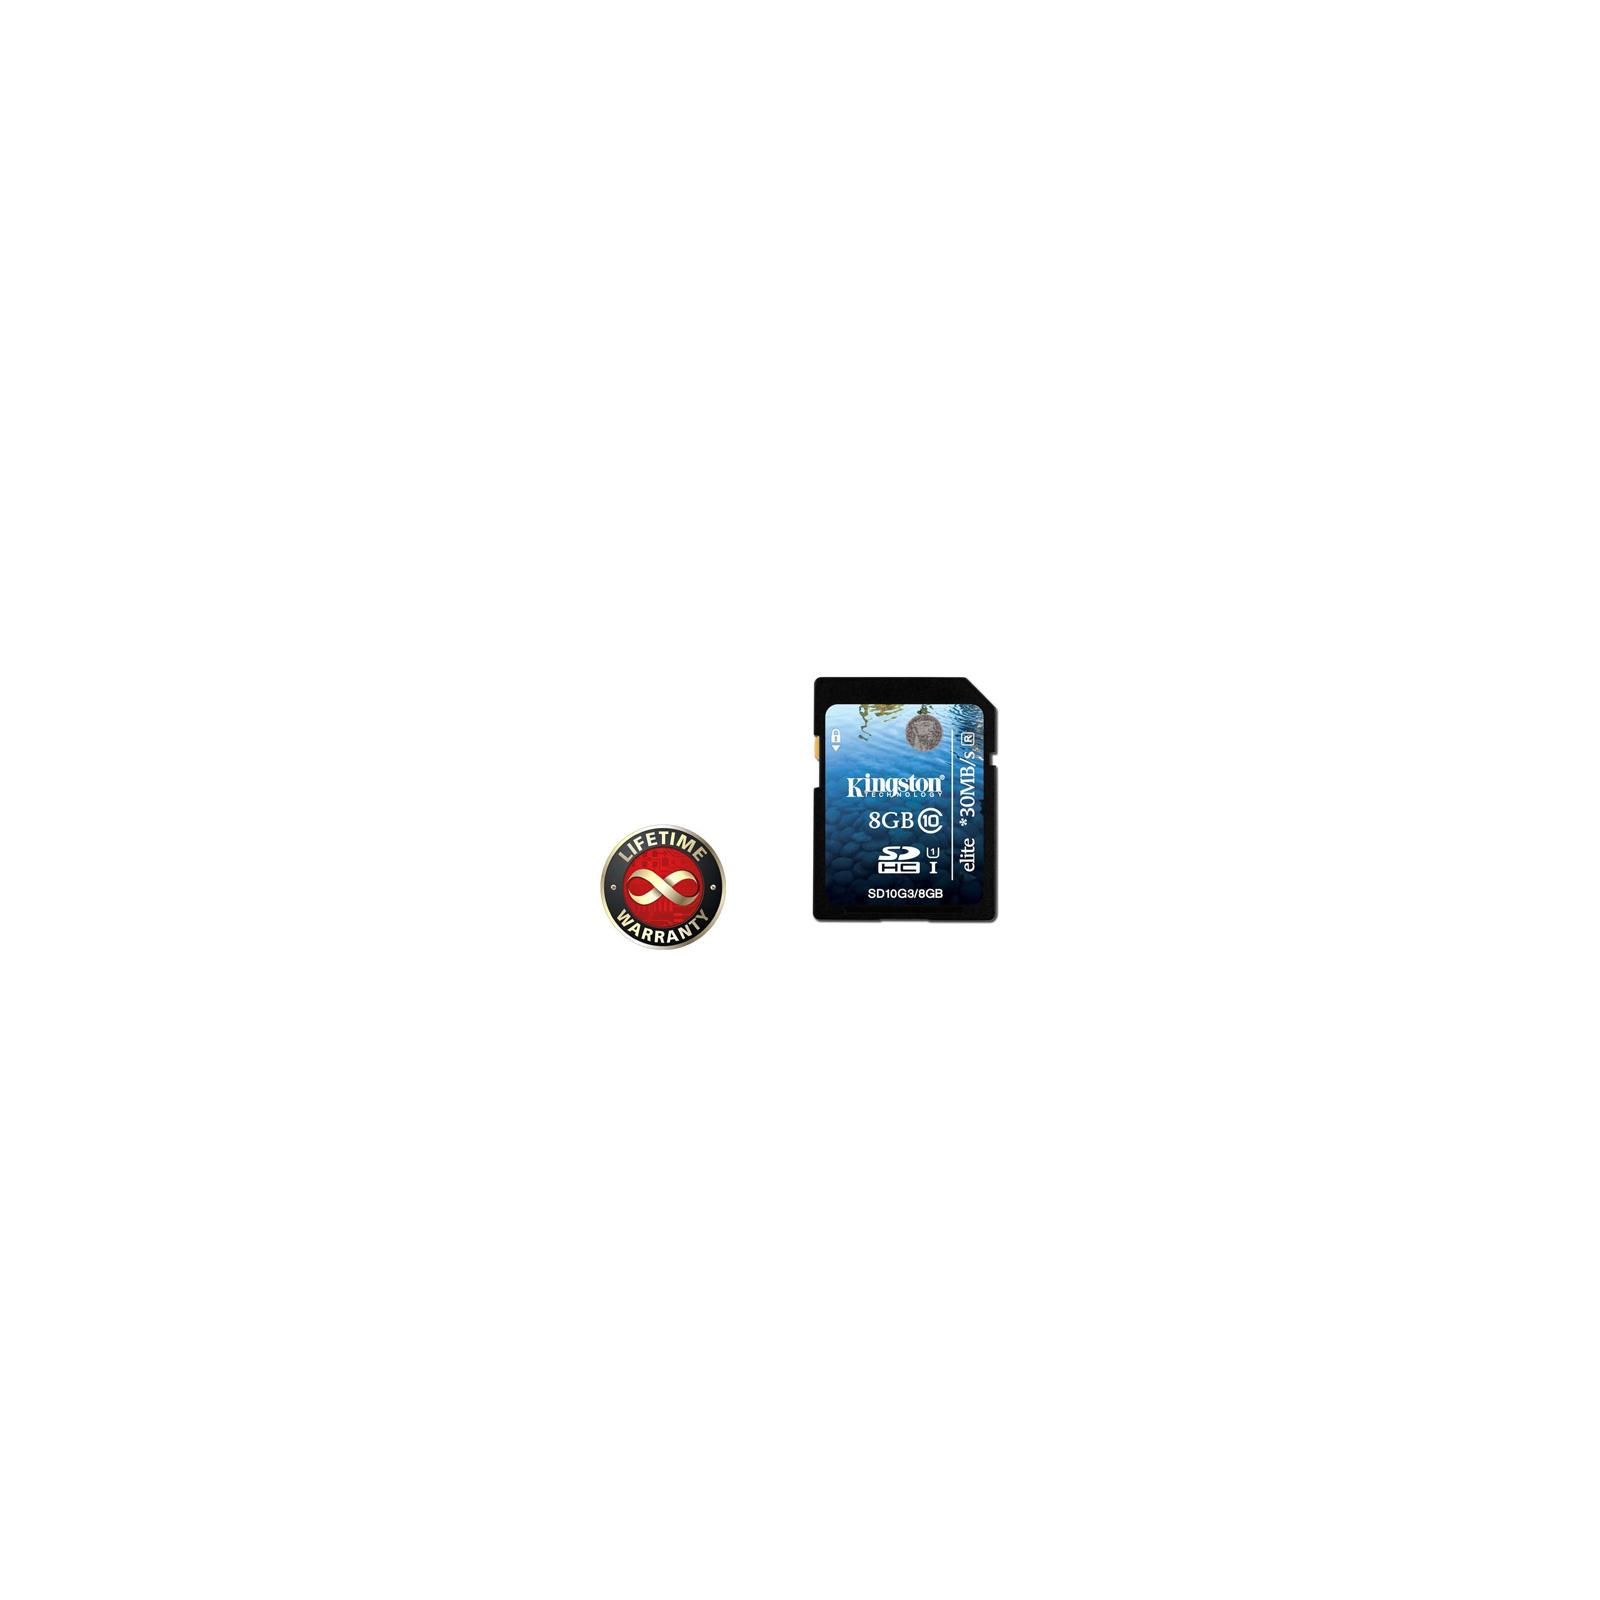 Карта памяти Kingston 8Gb SDHC class 10 UHS-I Elite Generation 3 (SD10G3/8GB)